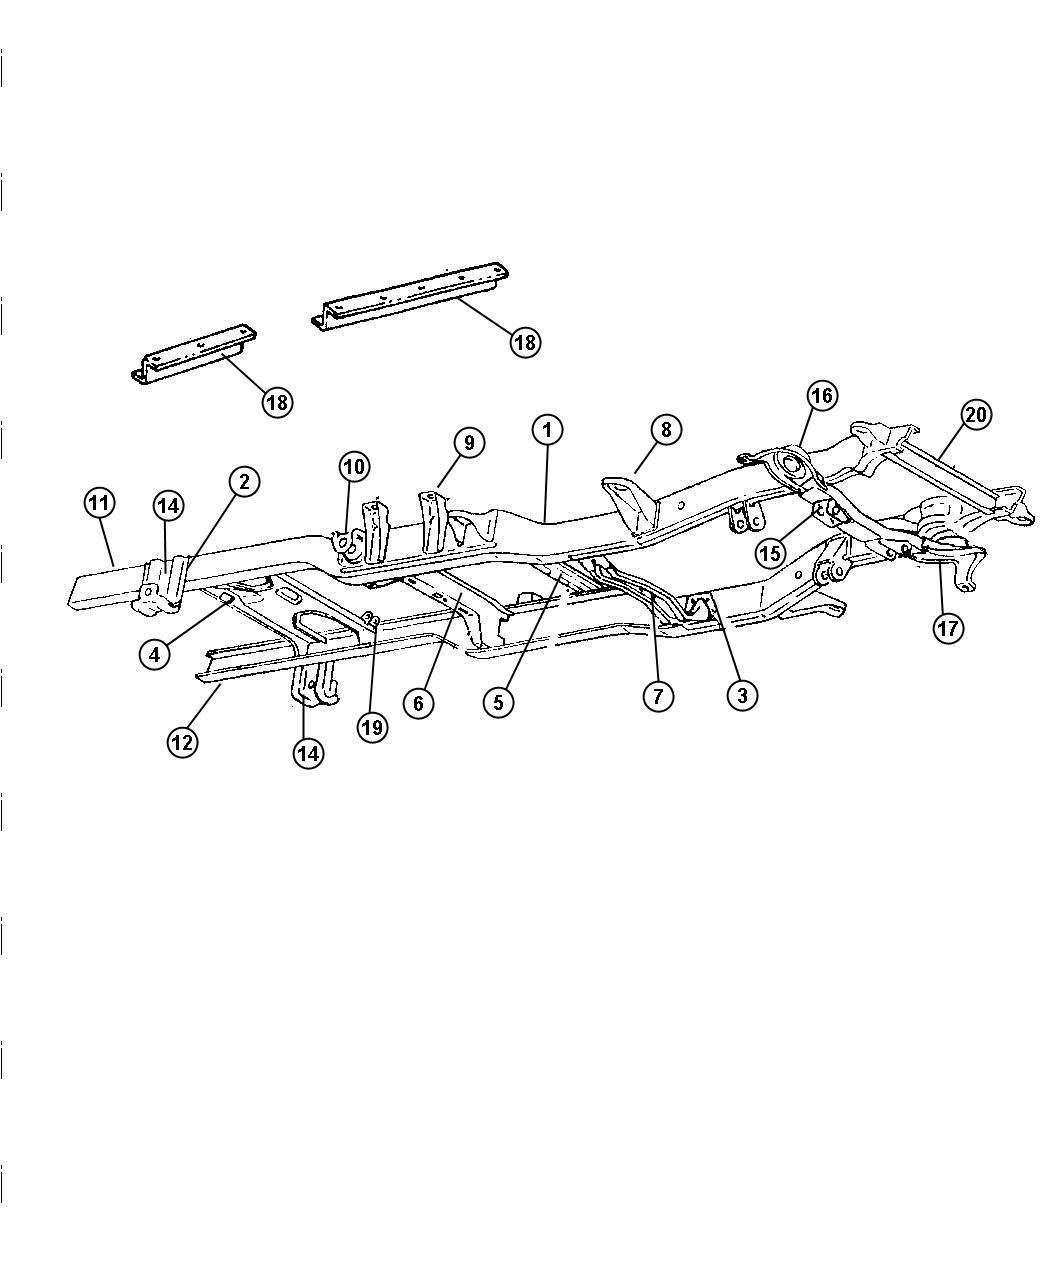 1998 dodge ram 3500 bracket  shackle  rear  rear hanger  rear spring  reqmt